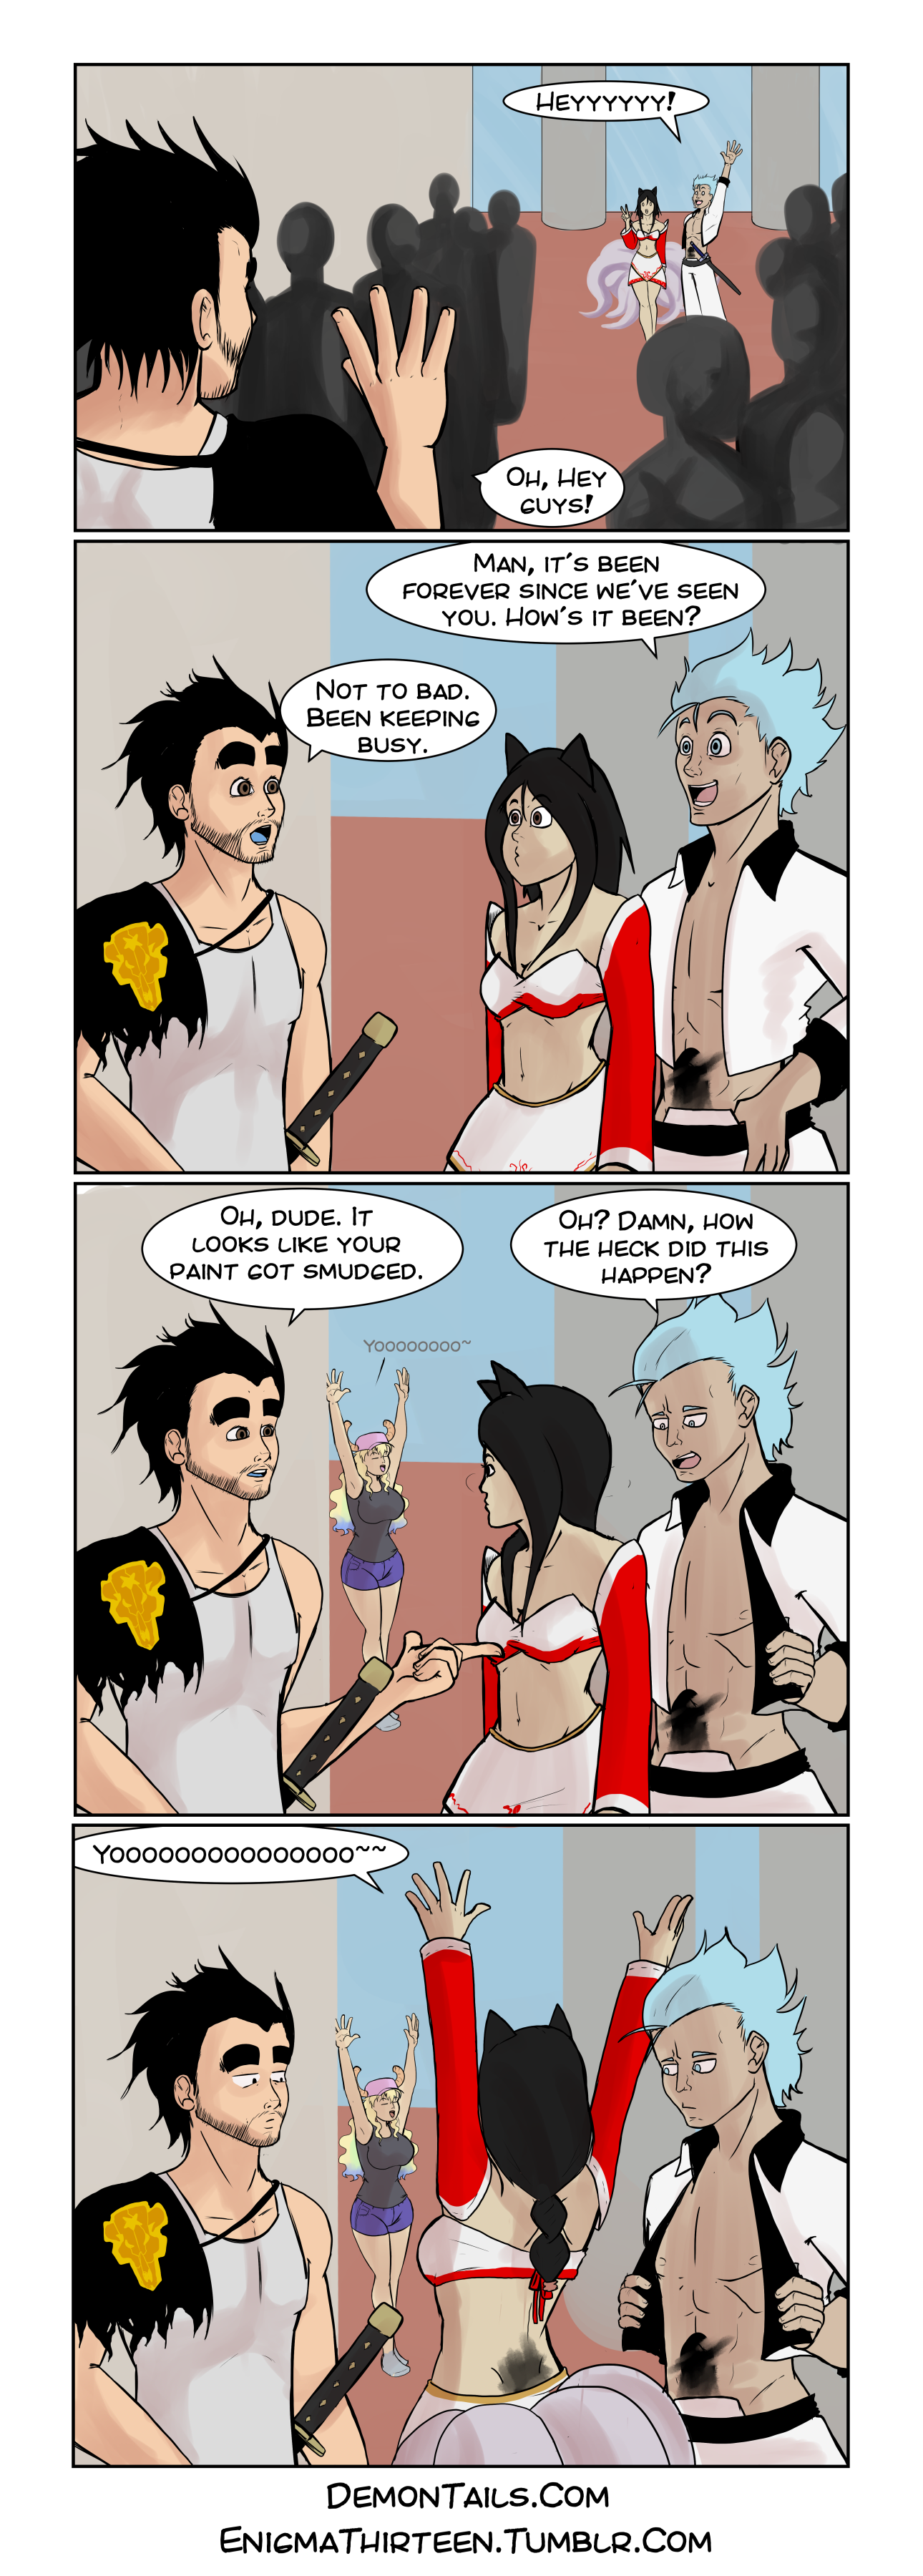 Awkward Consequences